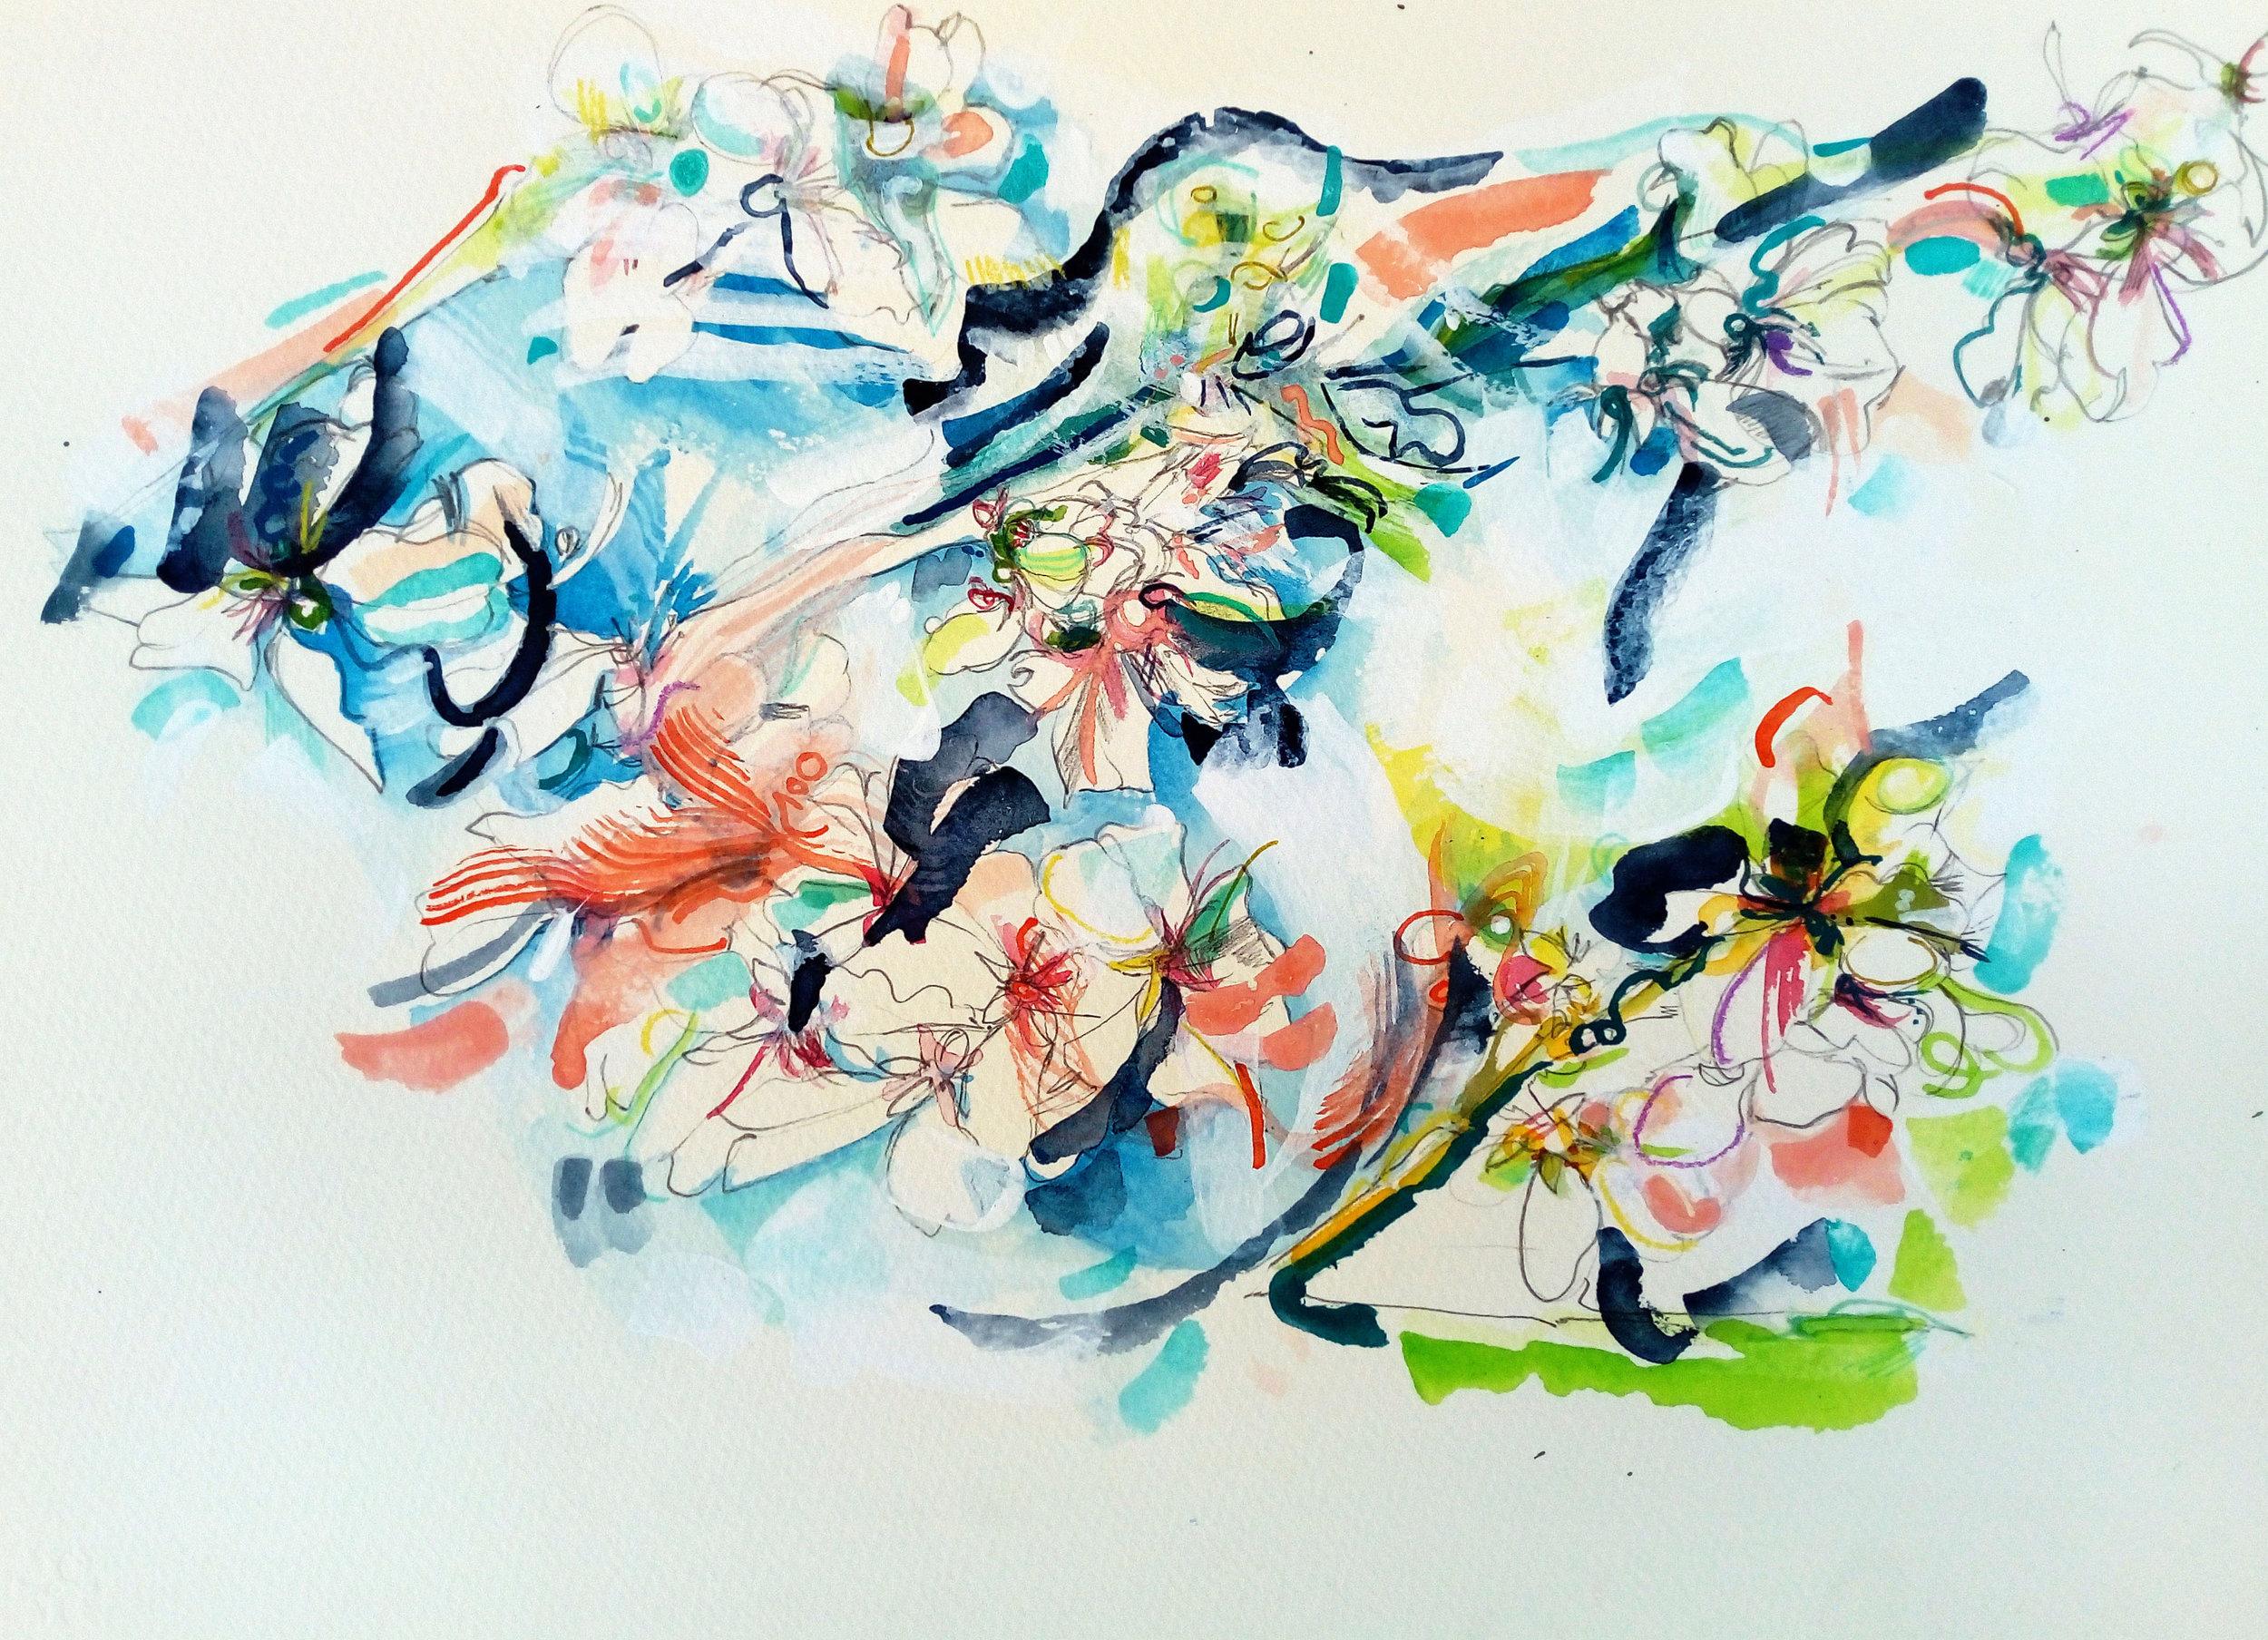 almond blossom, watercolour & pen on saunders 300gm 100% cotton rag not surface watercolour paper, 38x28cm, march 2019 £220